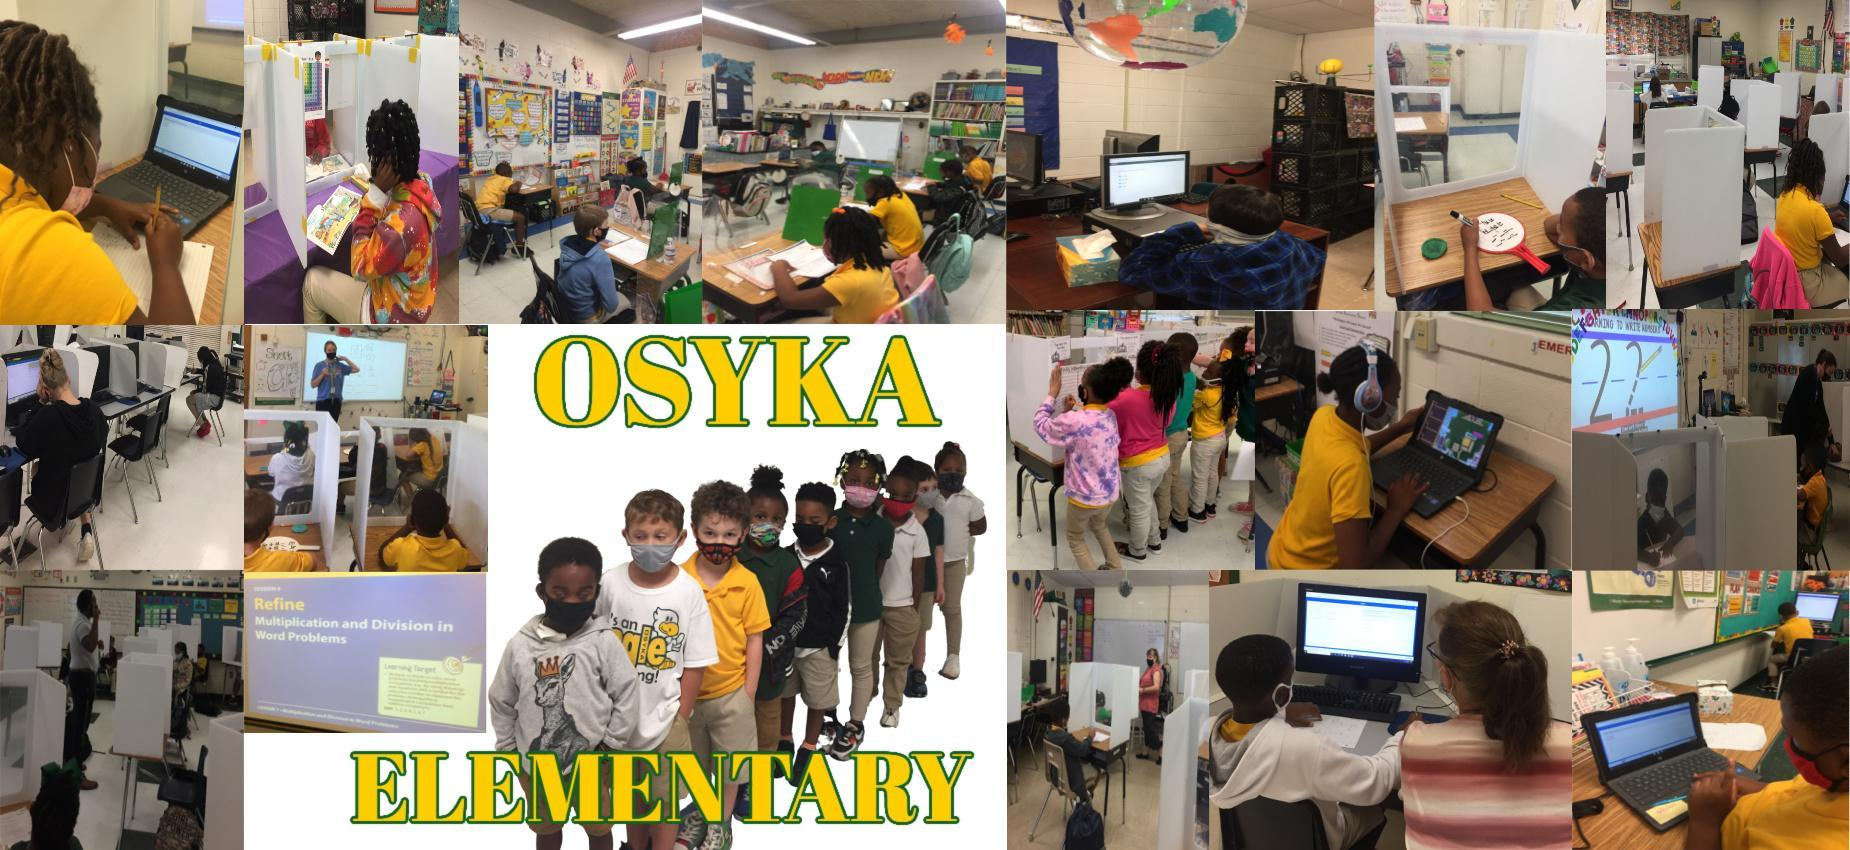 Osyka Elementary